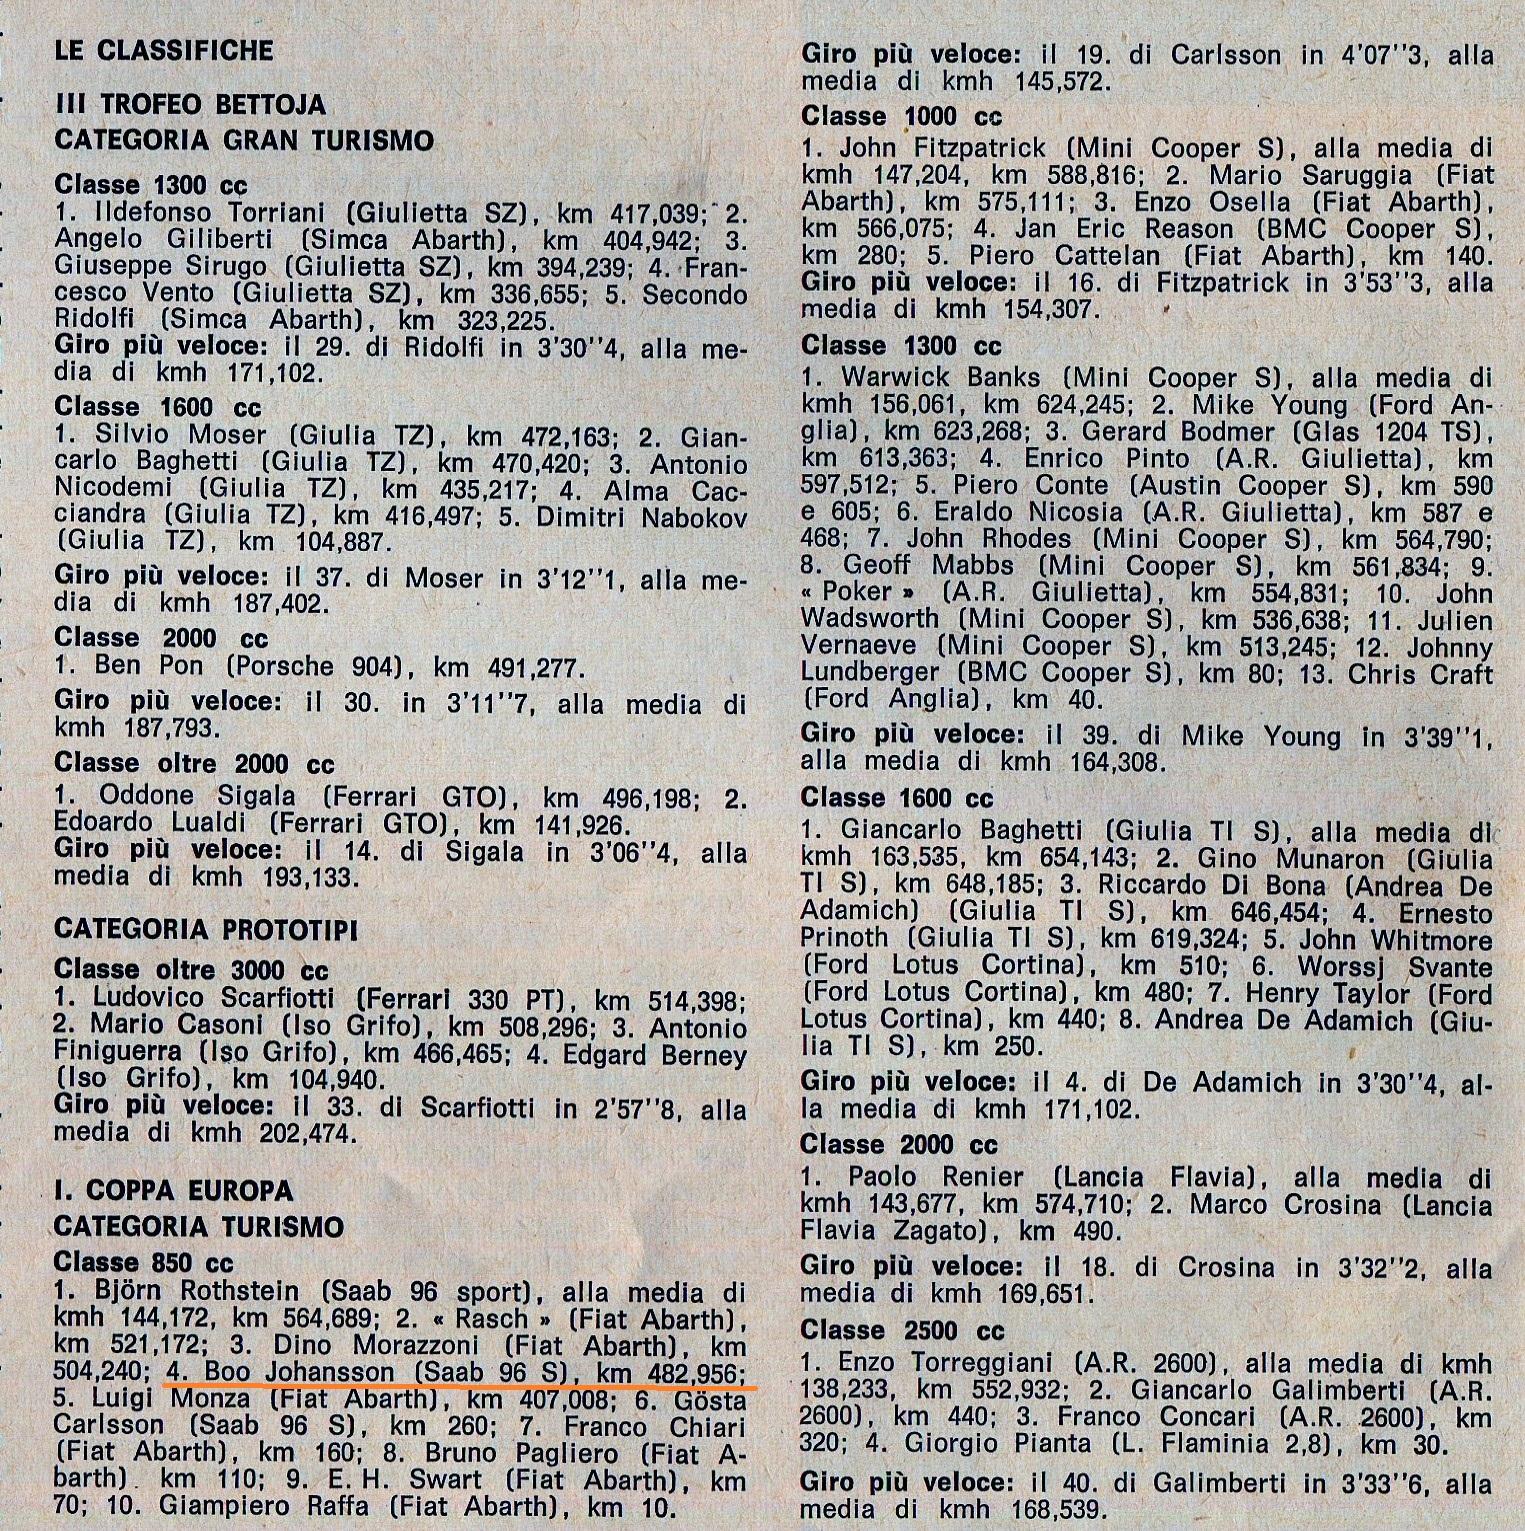 img392 Monza Ia Coppa Europa 1964 a